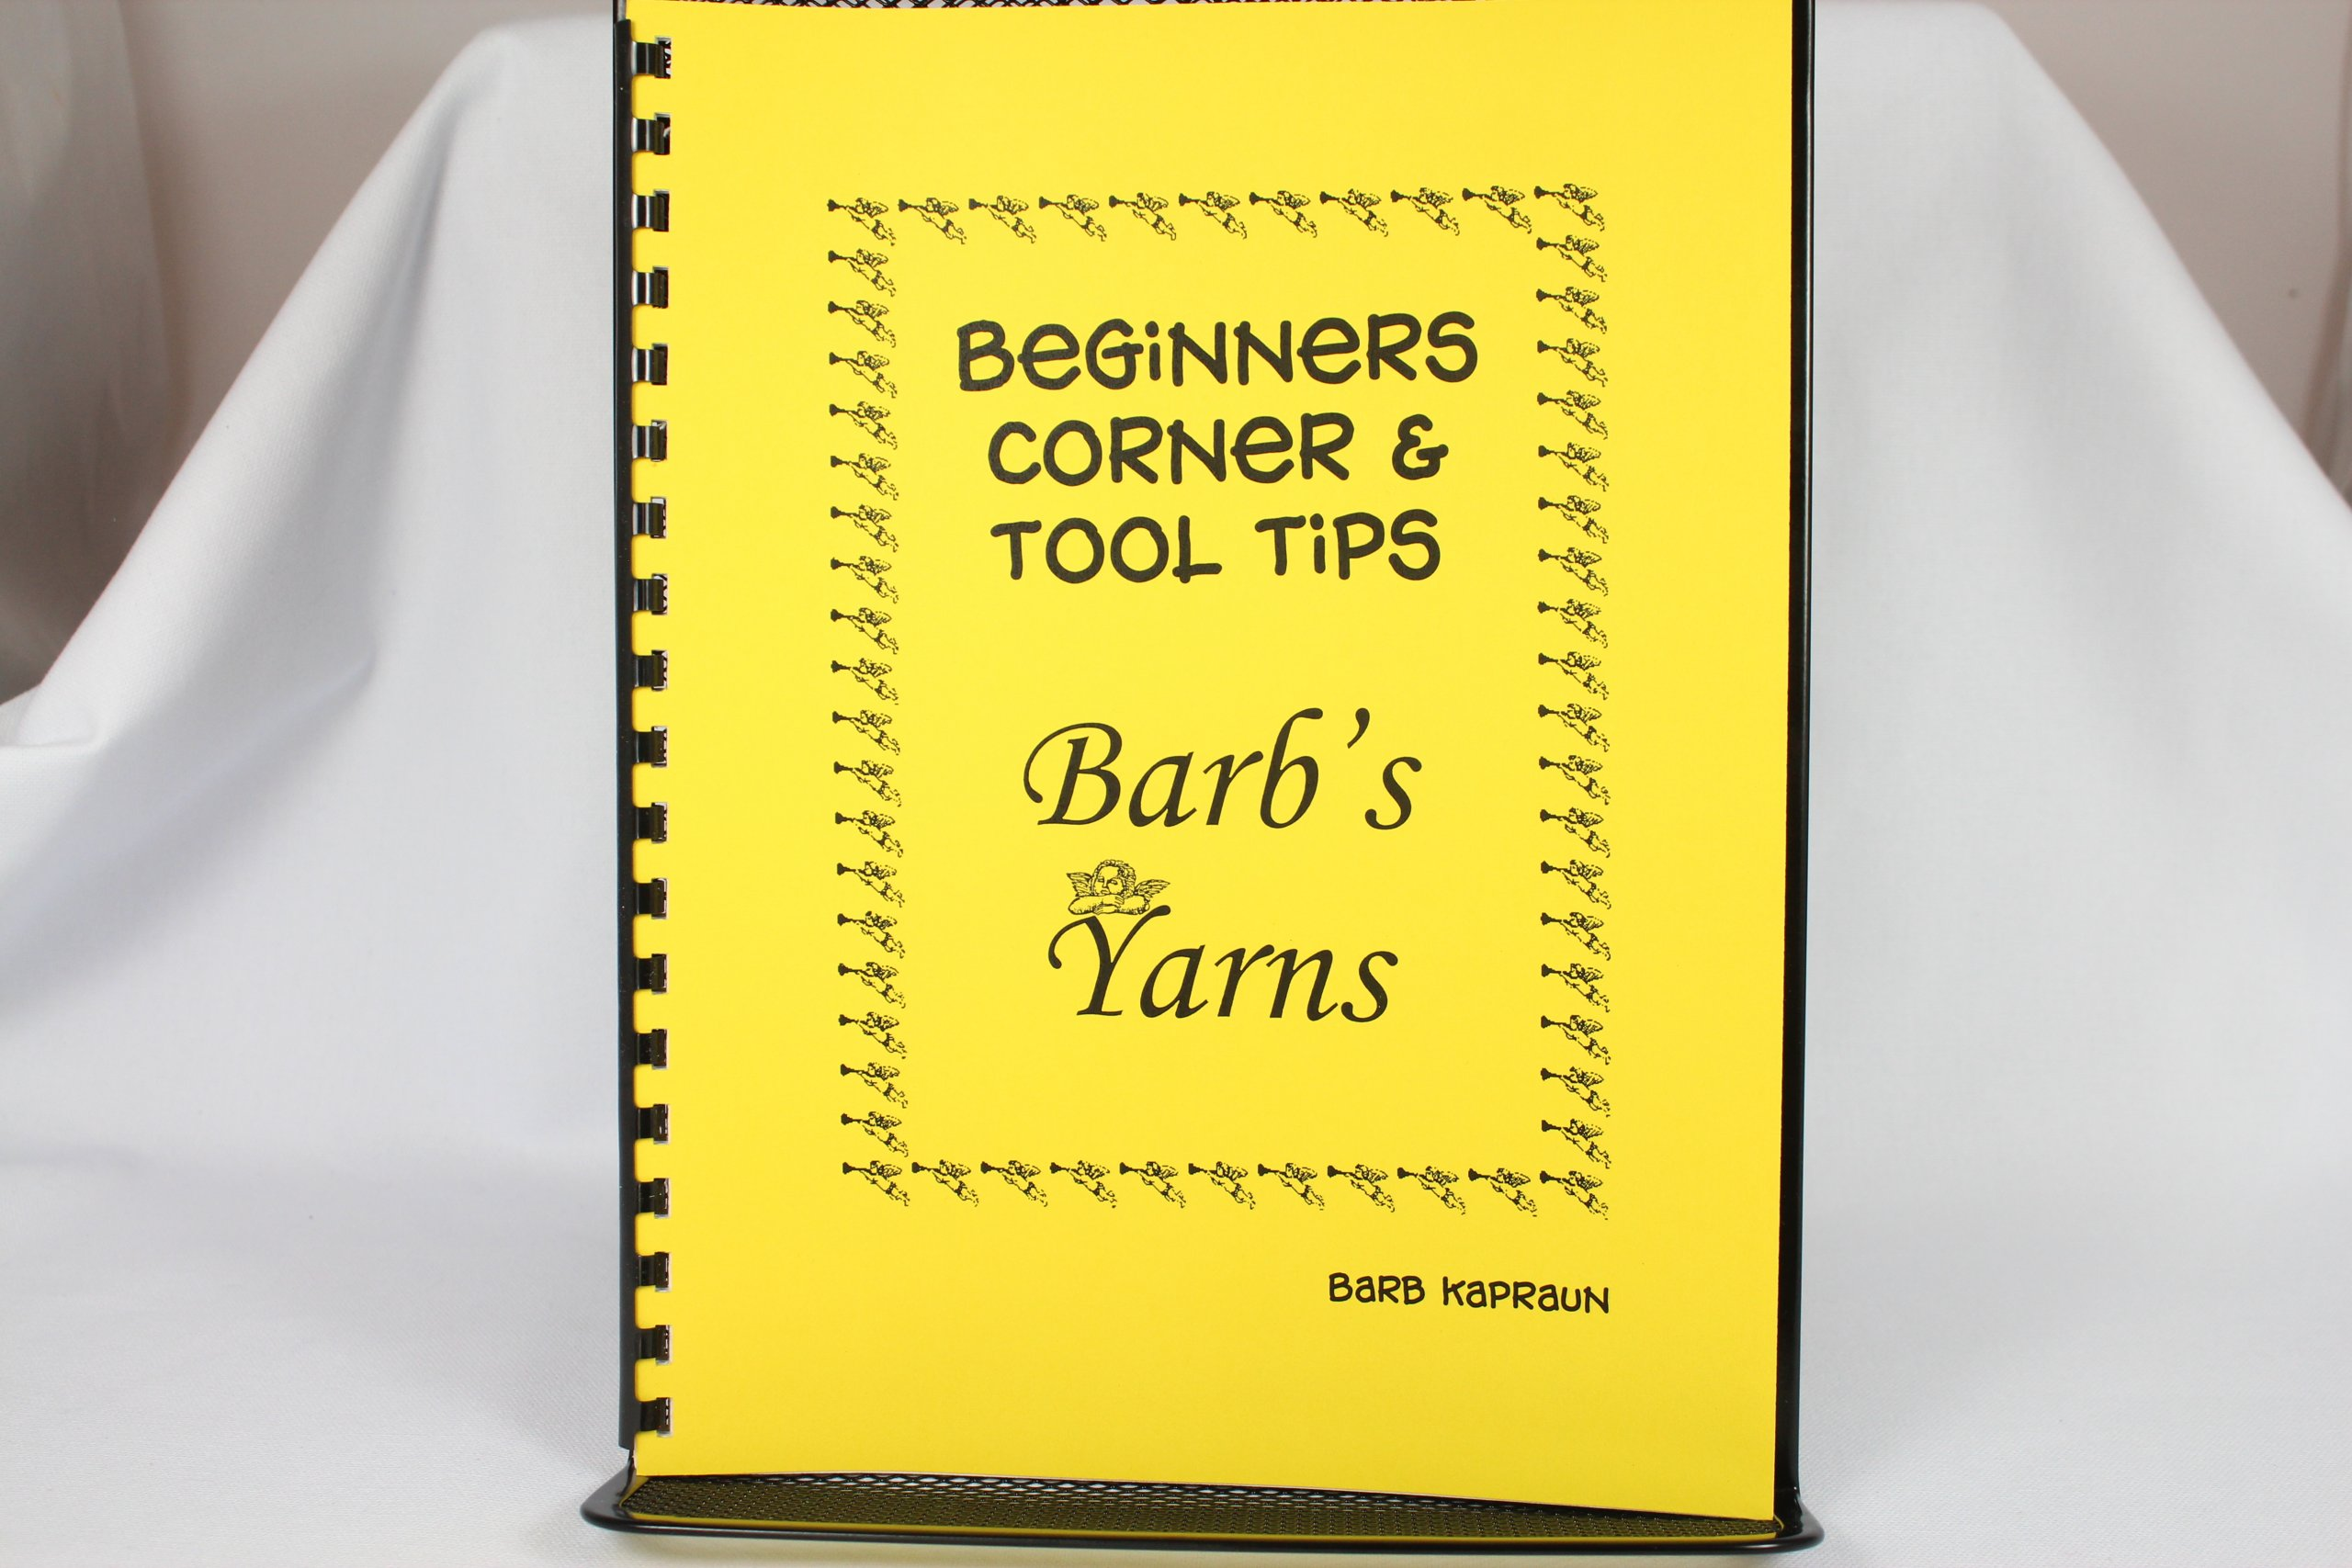 2307 Beginners Corner & Tool Tips